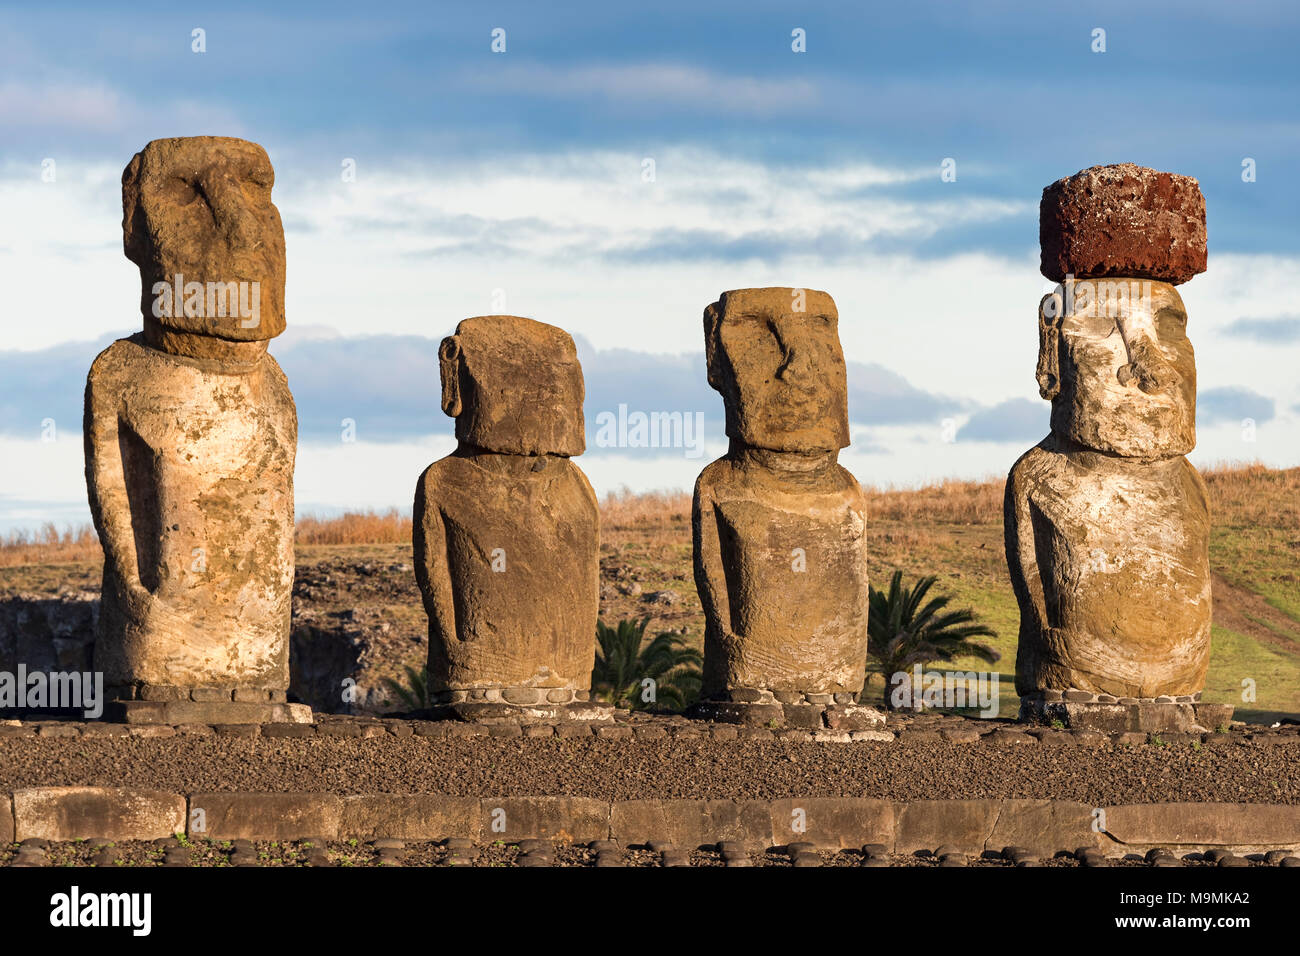 Figure in pietra, gruppo di Moais, Ahu Tongariki, Isola di Pasqua, Cile Immagini Stock